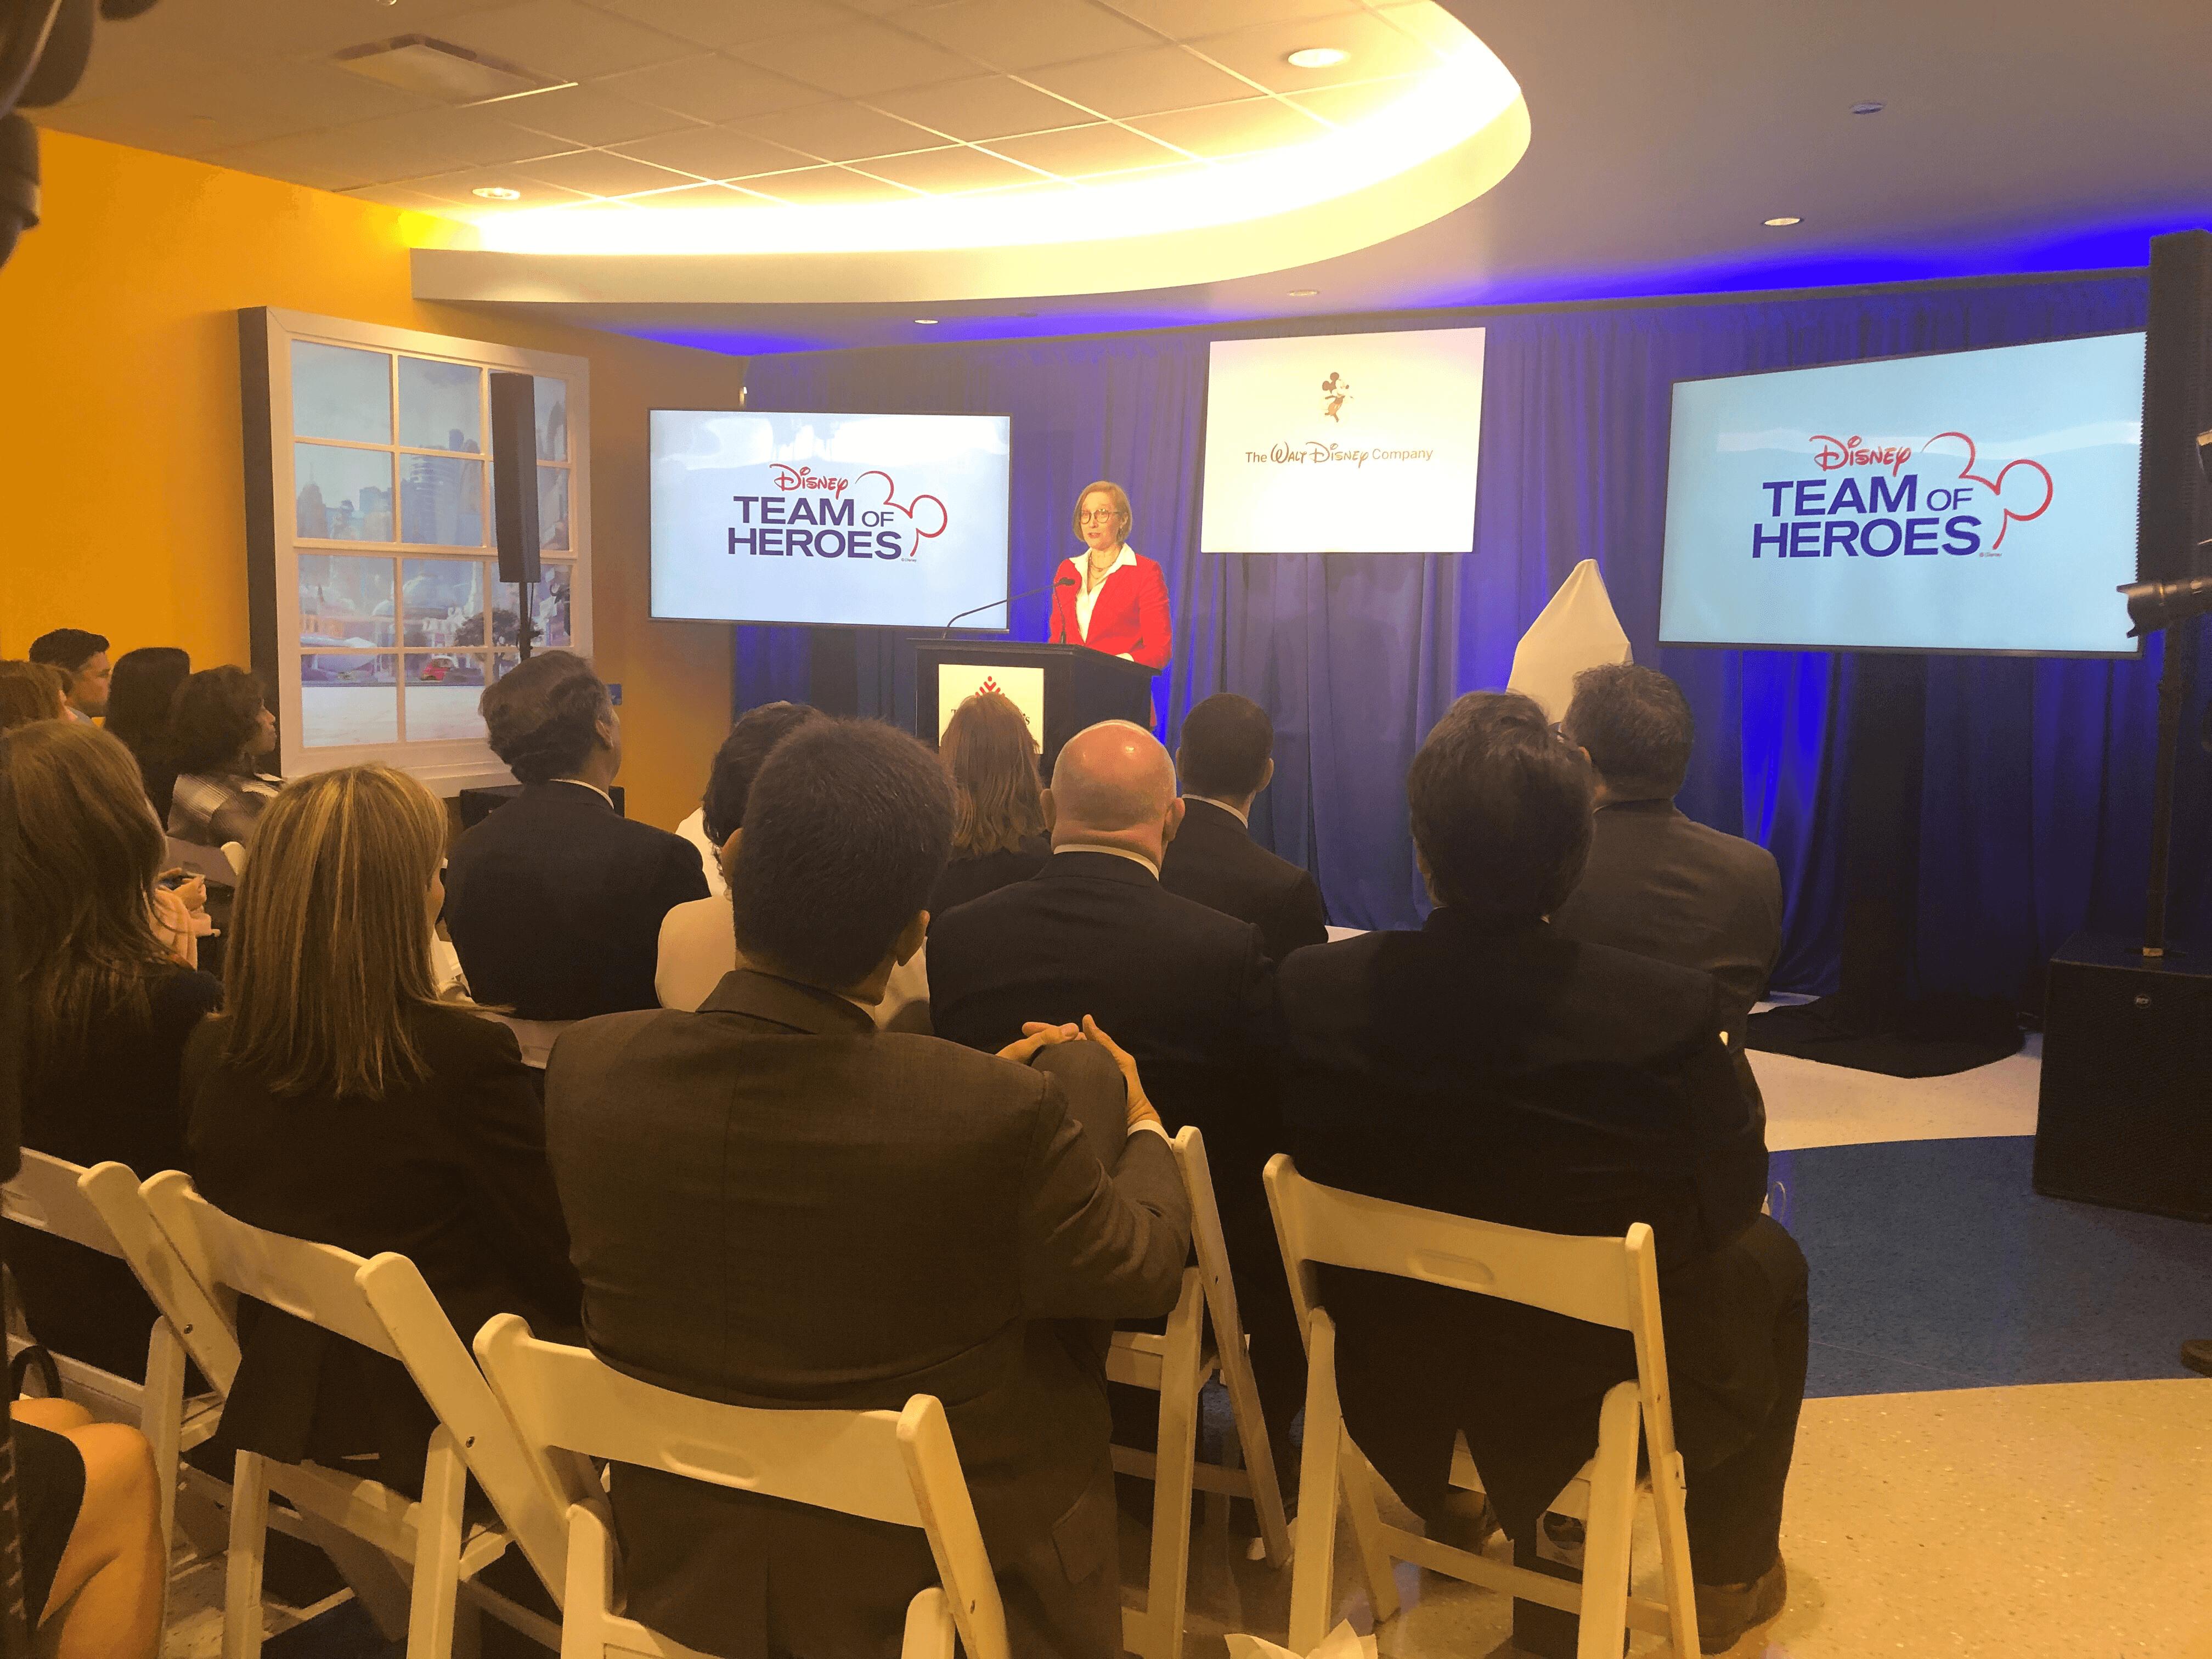 Elissa Margolis, senior vice president of enterprise social responsibility for The Walt Disney Co., speaks during the launch of the Disney Team of Heroes.